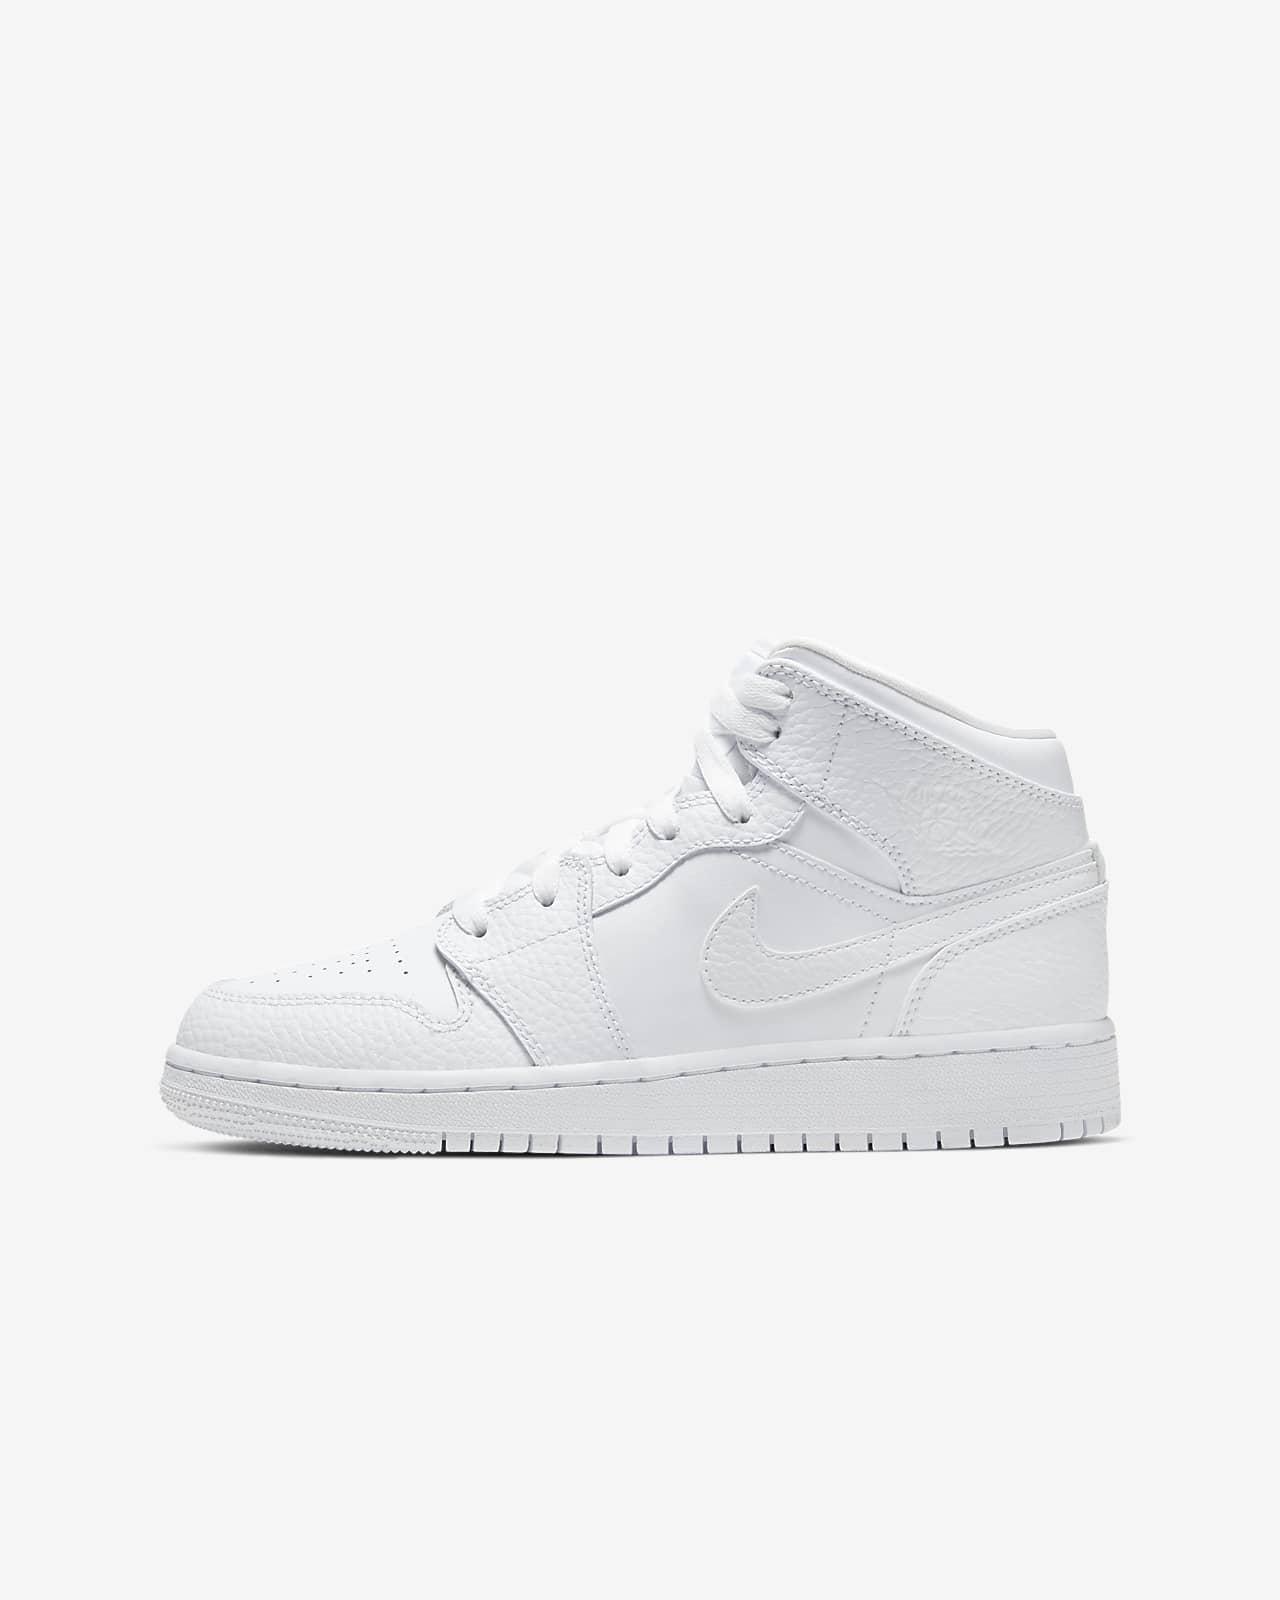 Air Jordan 1 Mid Older Kids' Shoe. Nike NO